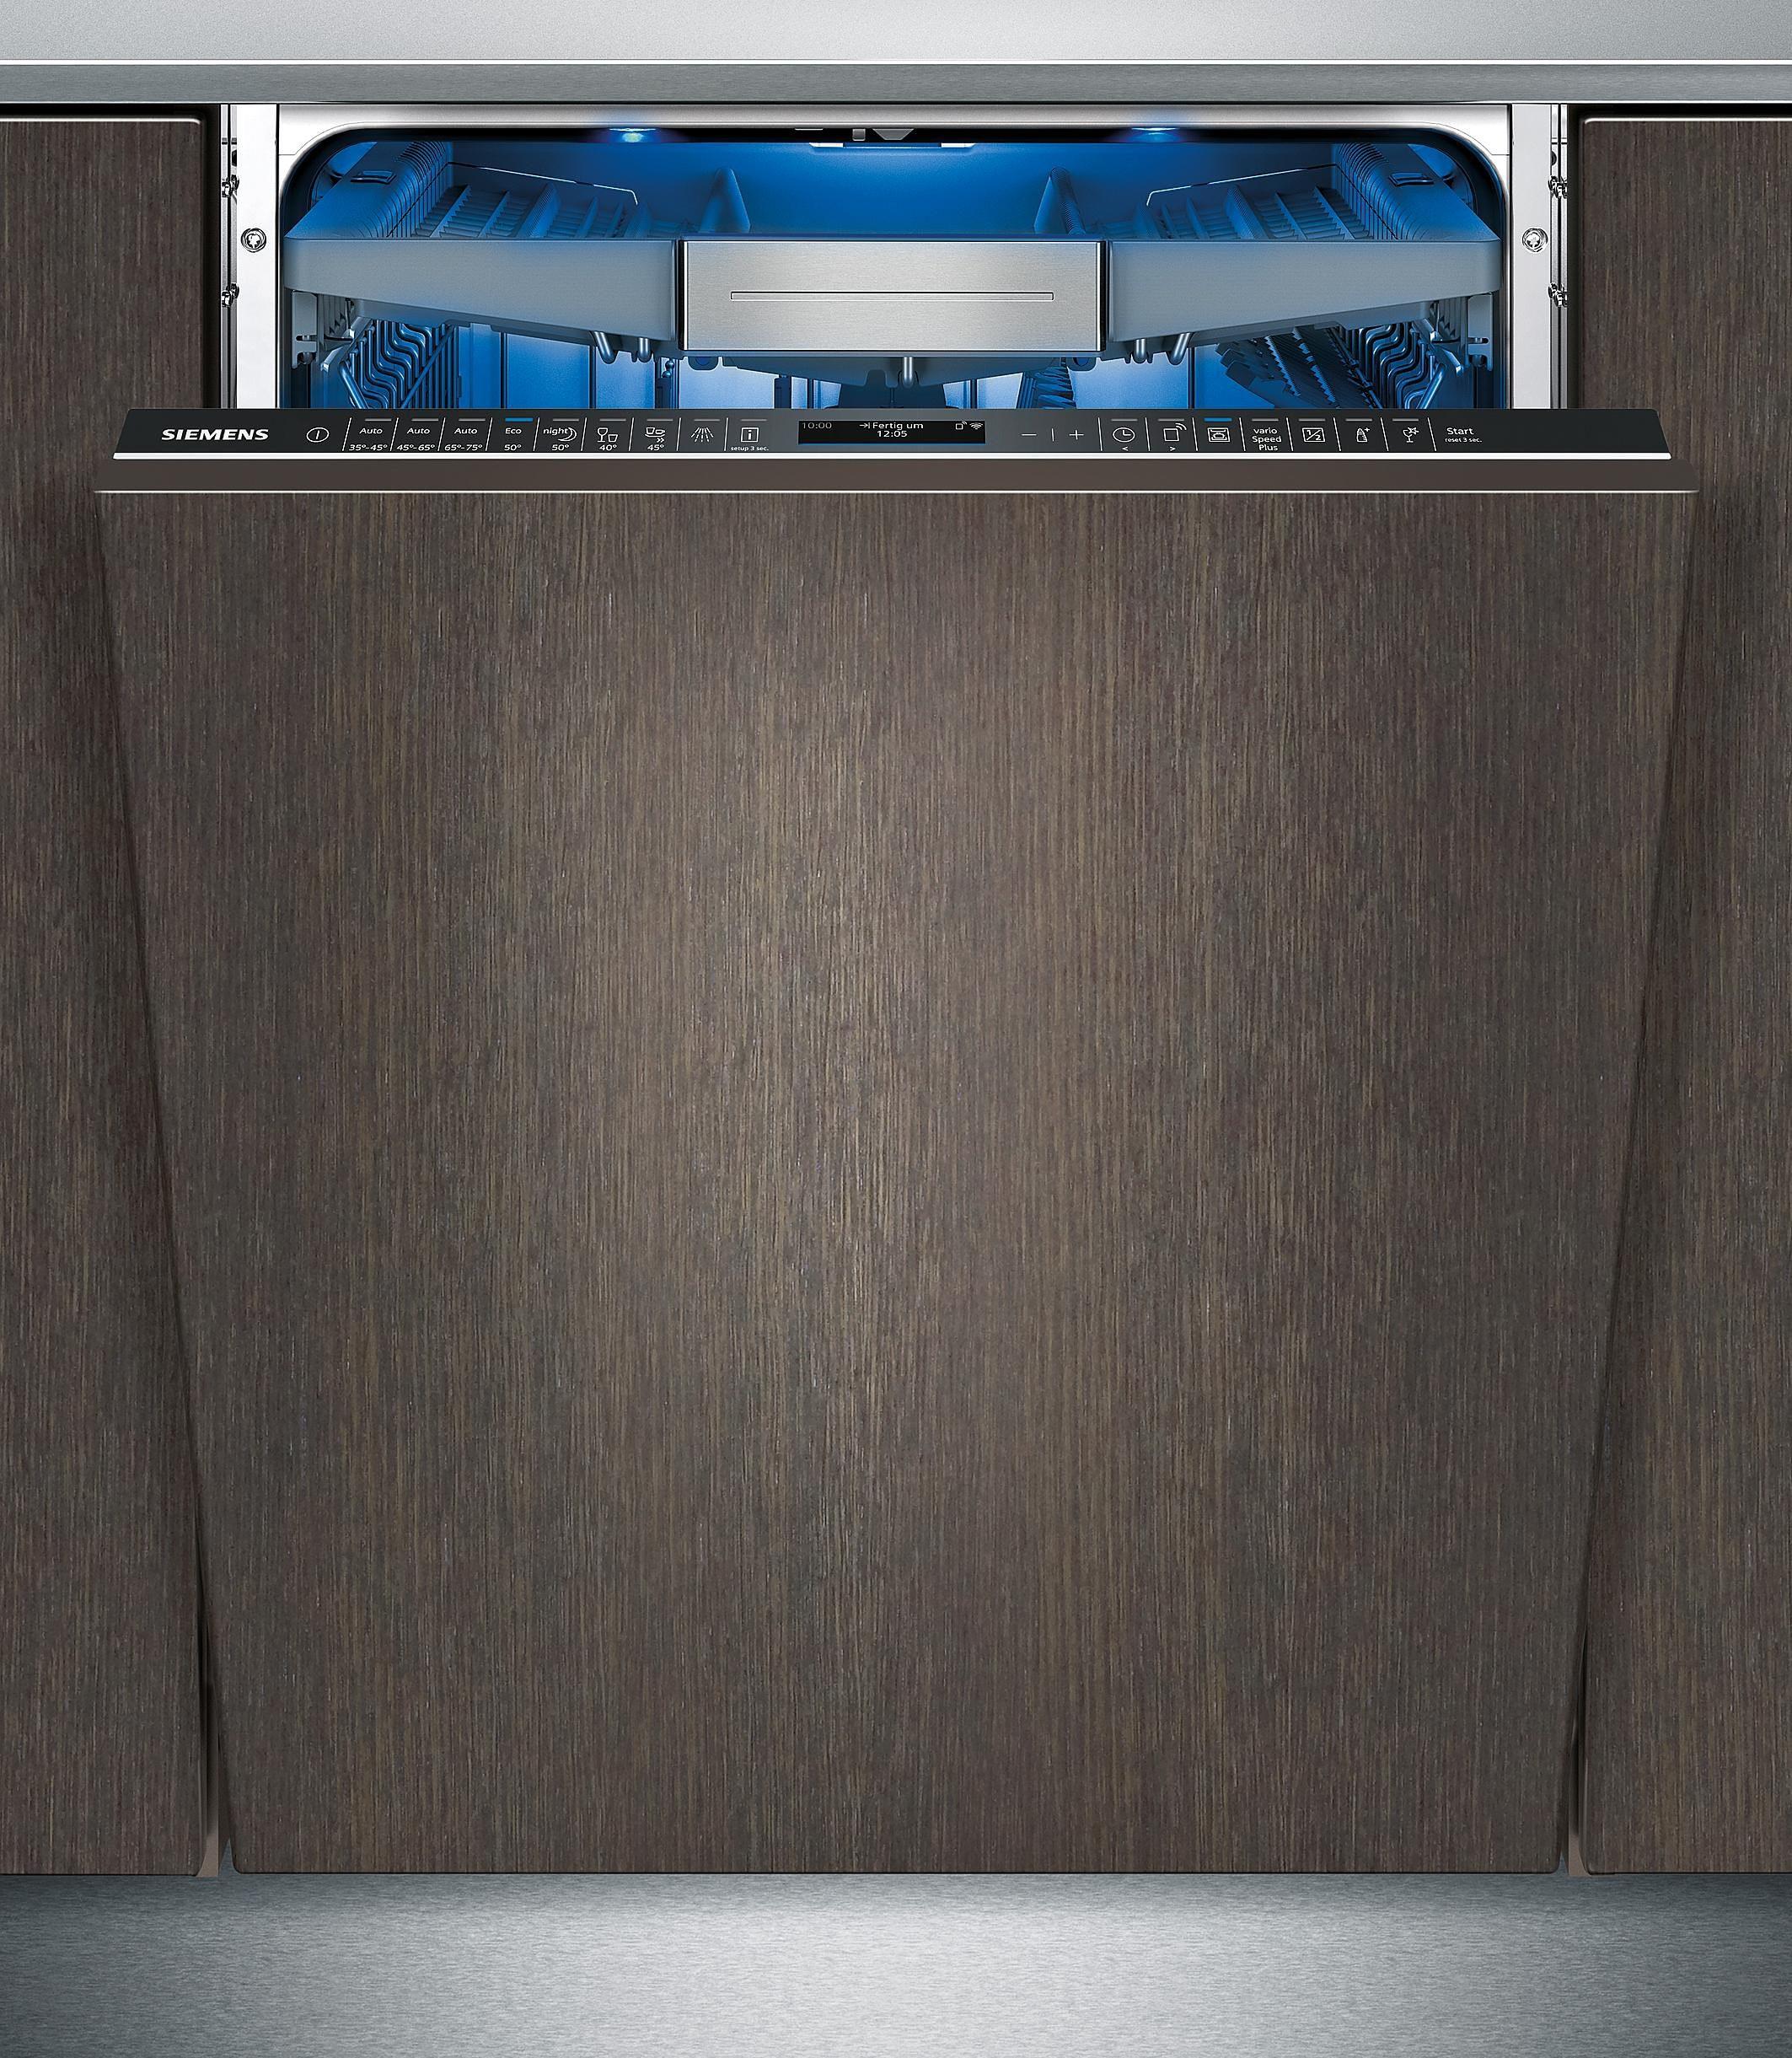 Siemens vollintegrierbarer Einbaugeschirrspüler SX678X16TE, A+++, 9,5 Liter, 14 Maßgedecke